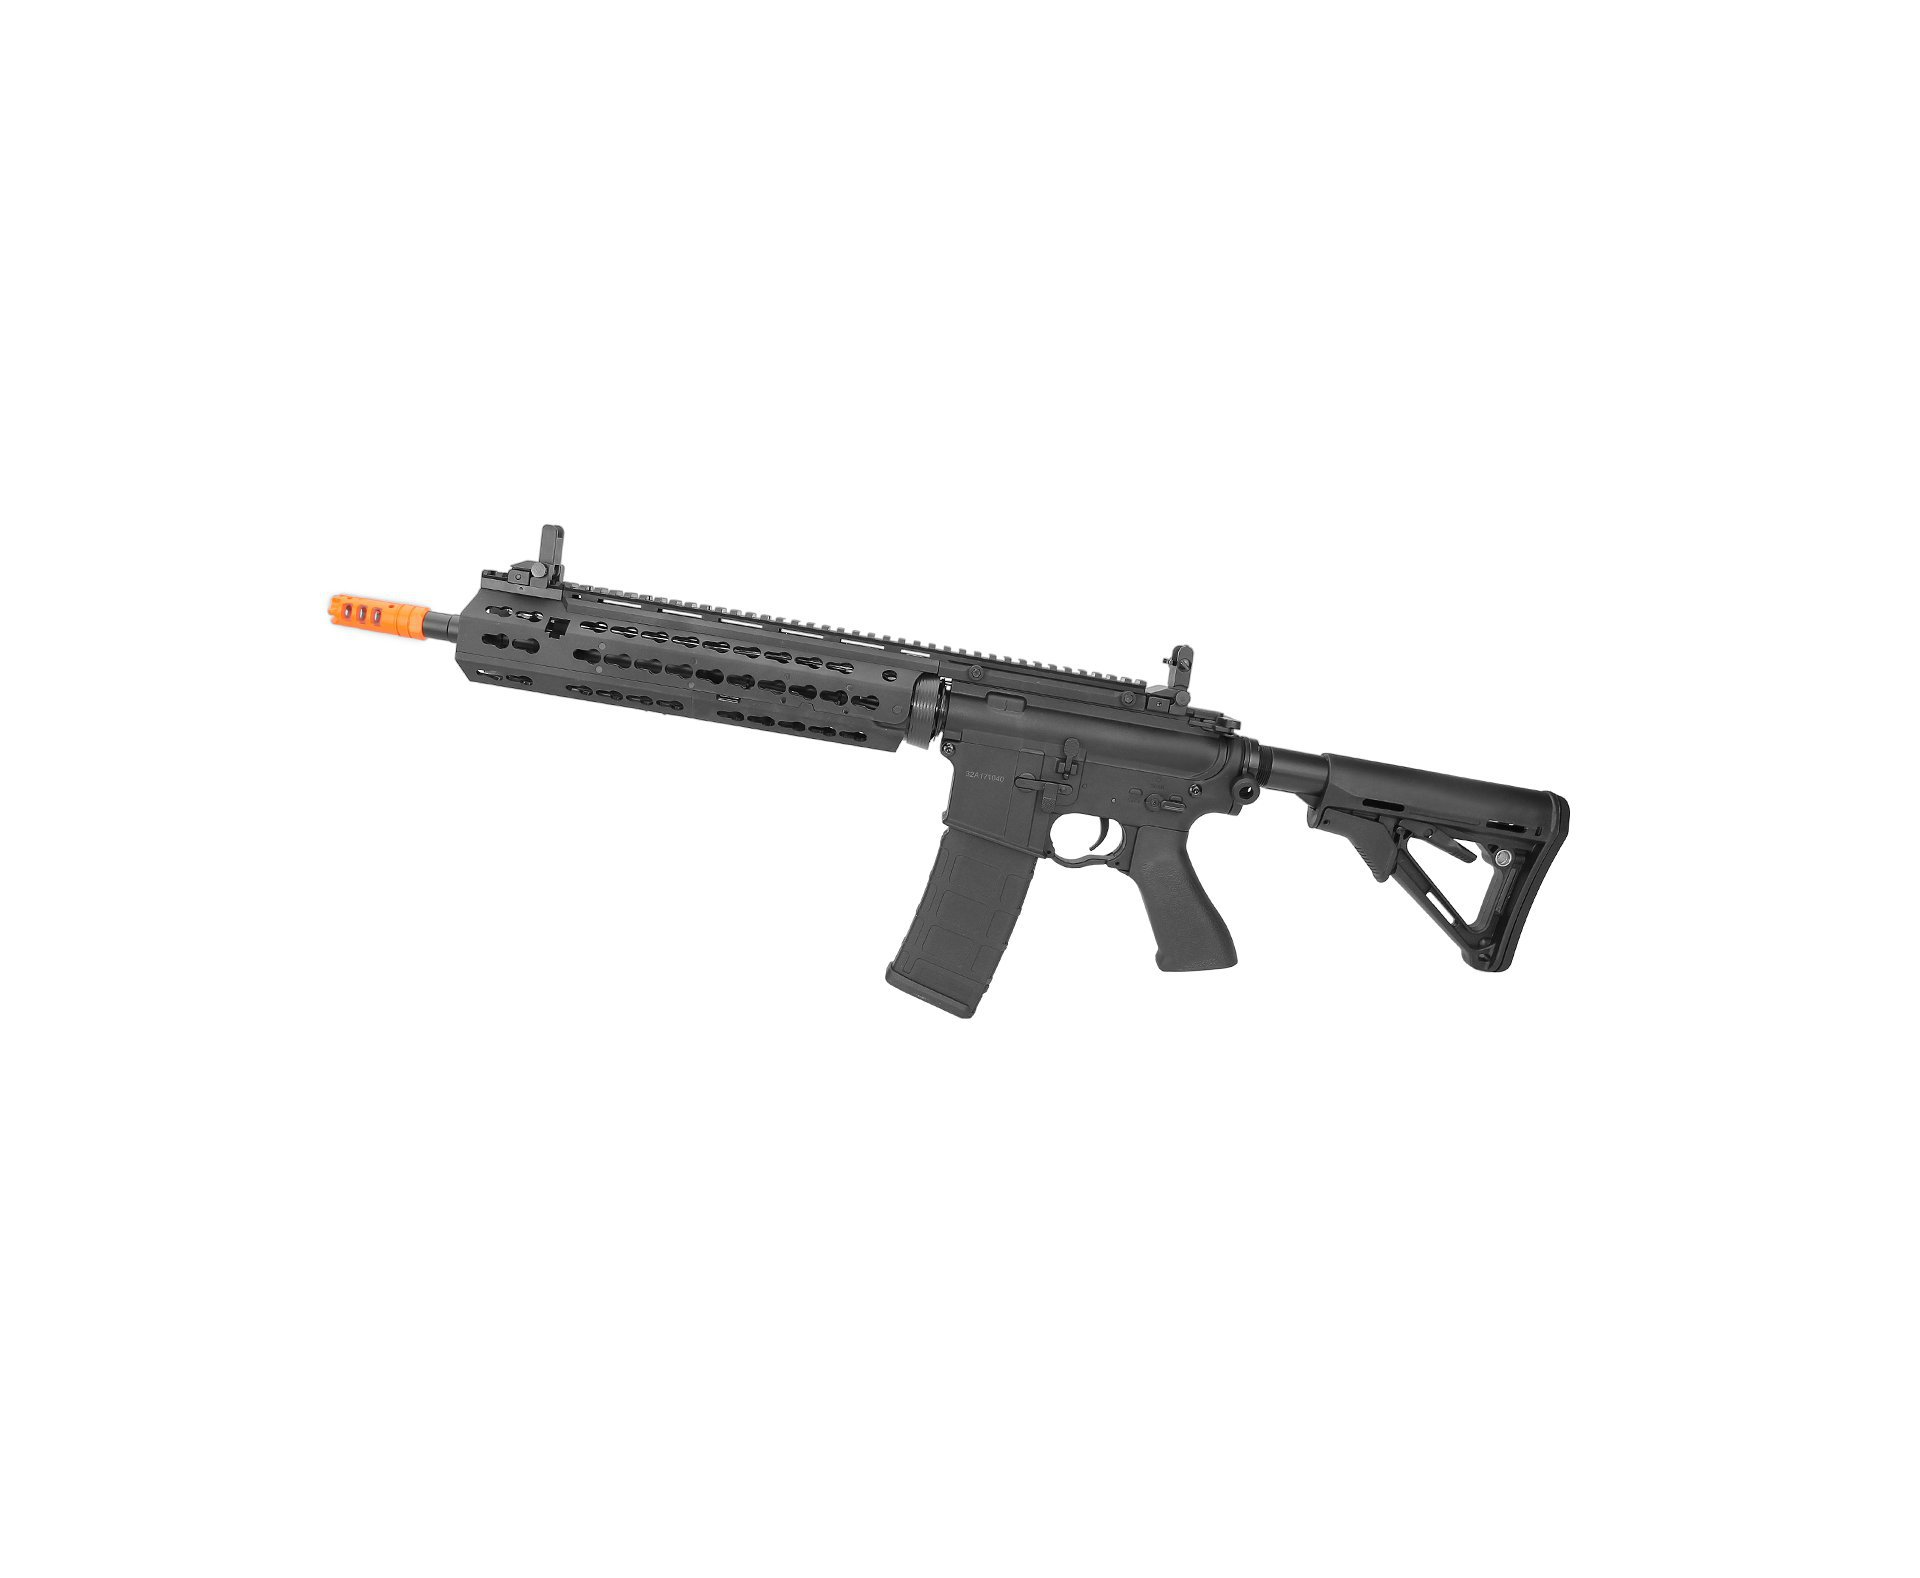 Rifle De Airsoft Cyma M4 Long Keymod Cm619a Bivolt Cal 6.0mm Cyma